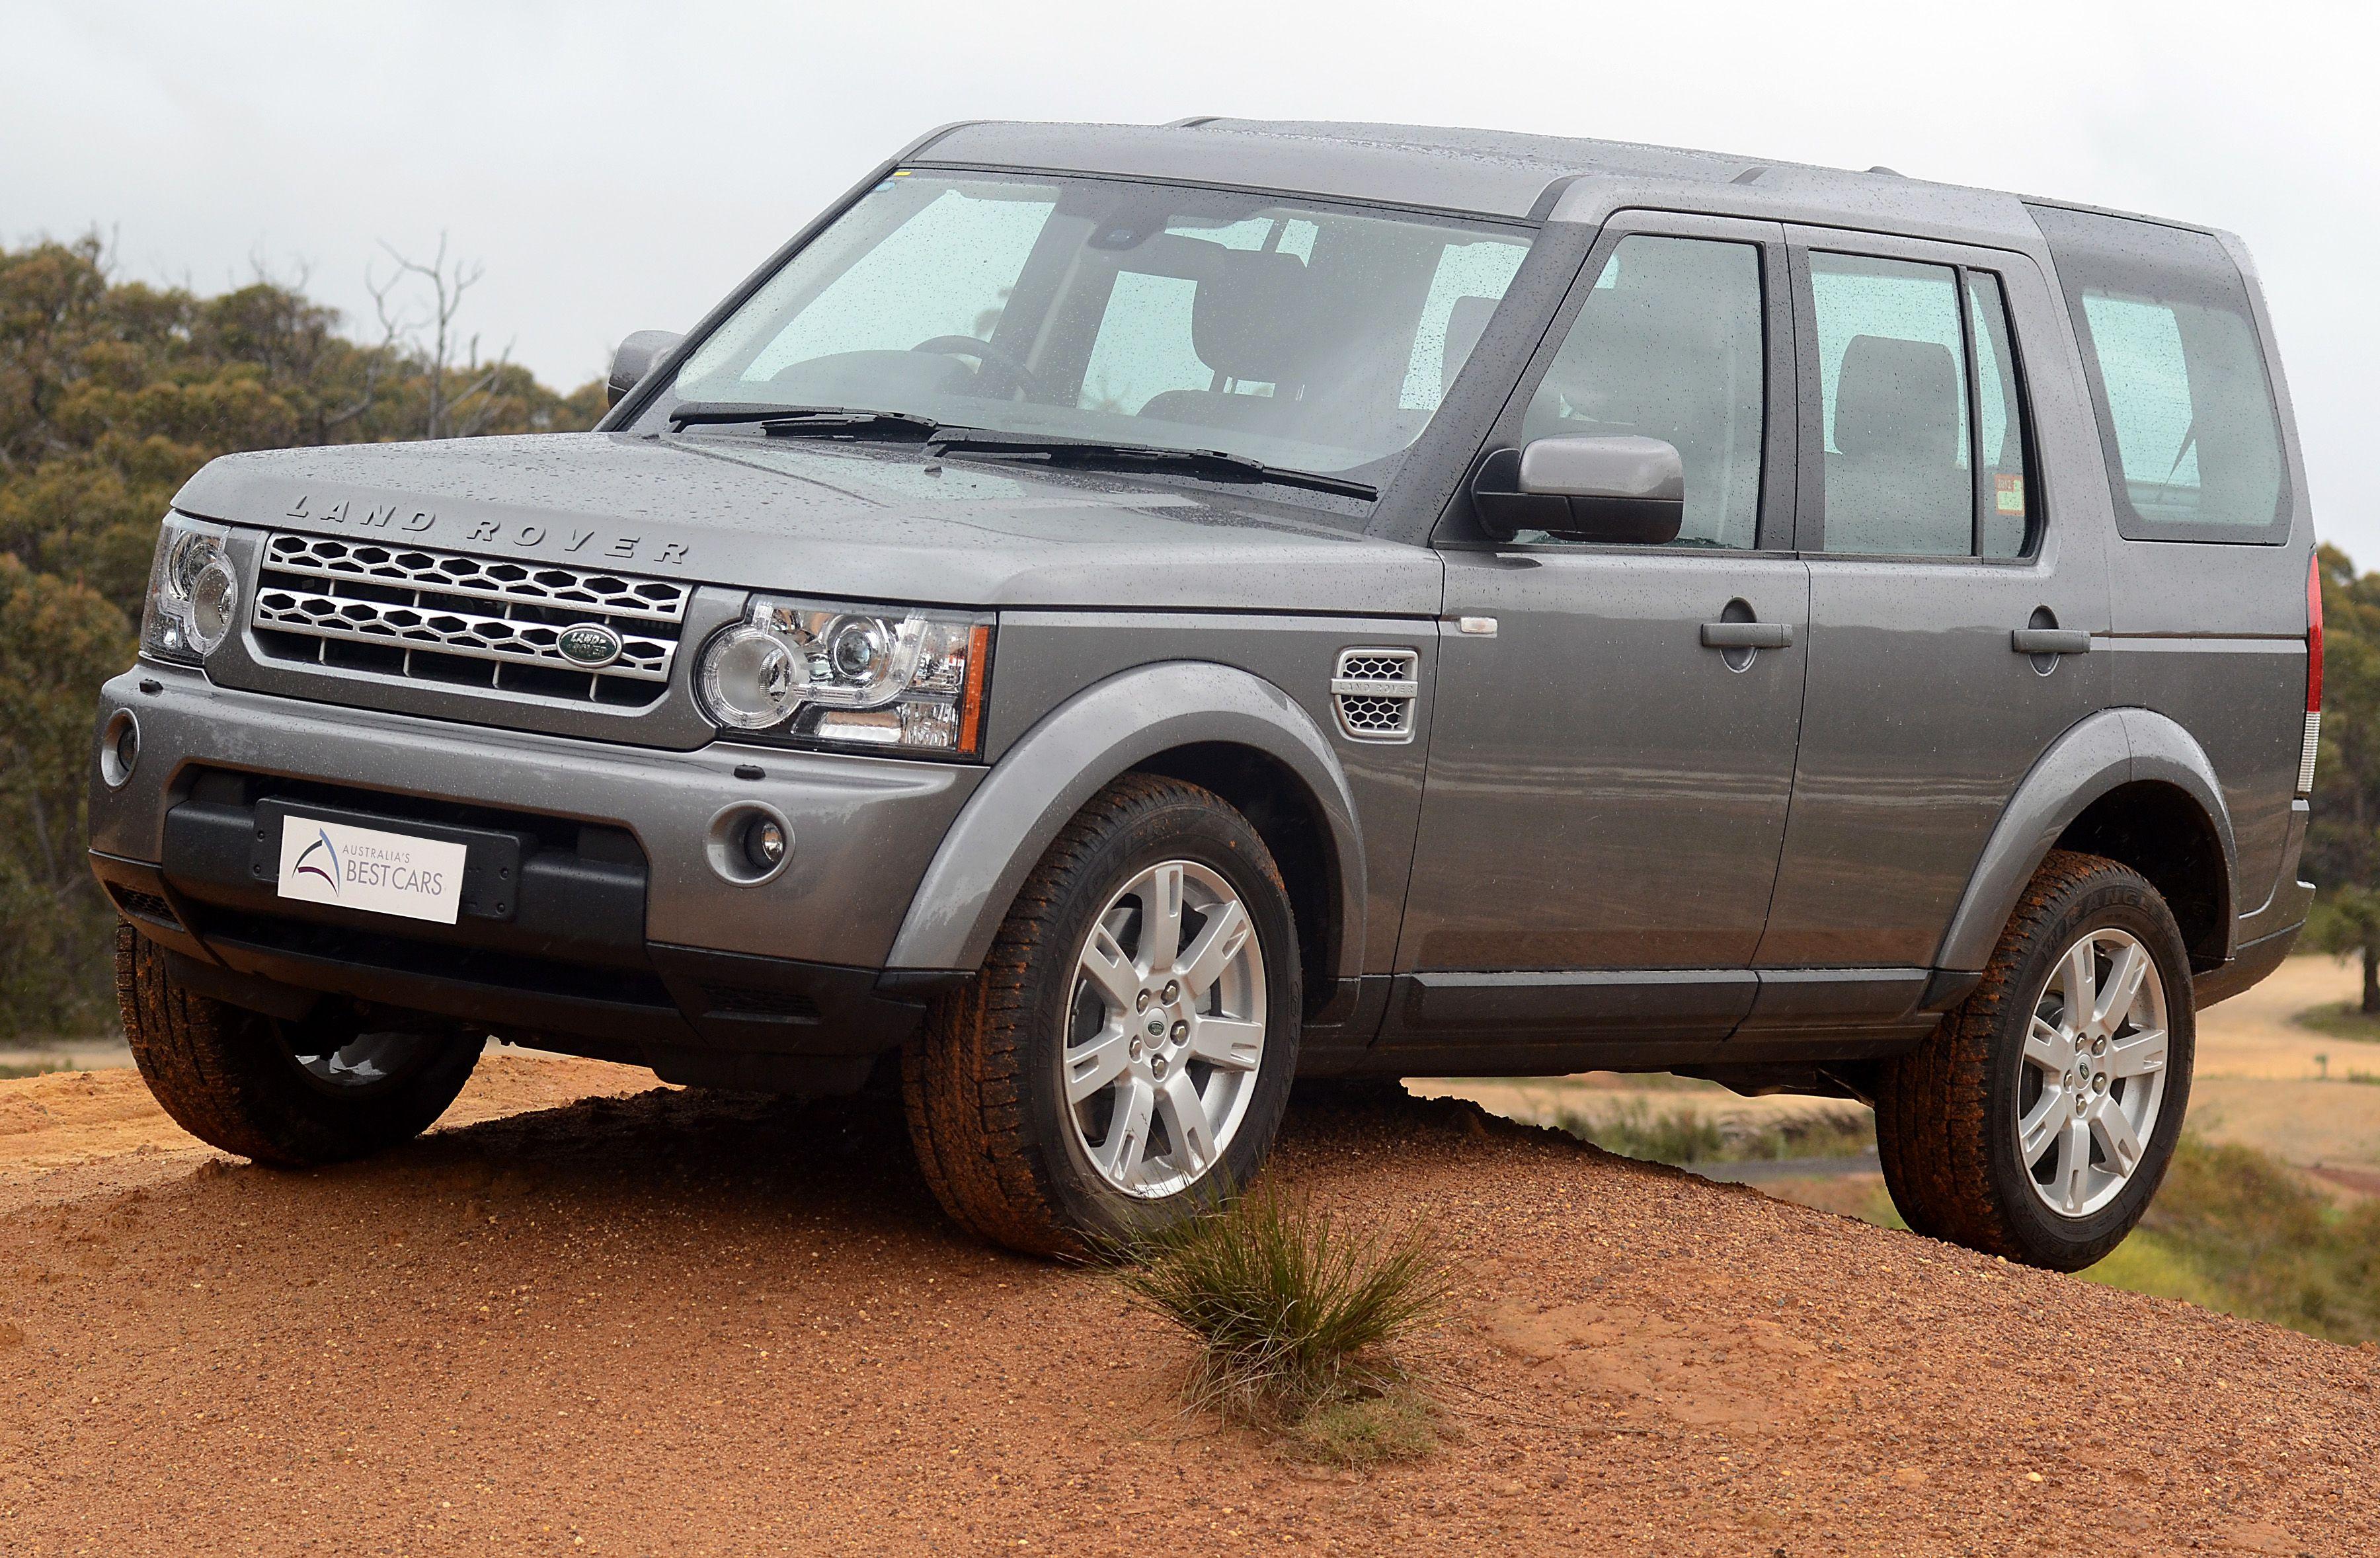 2011 land rover dc100 concept side 2 1280x960 wallpaper - 2011 Land Rover Discovery 4 Sdv6 Se Wagon